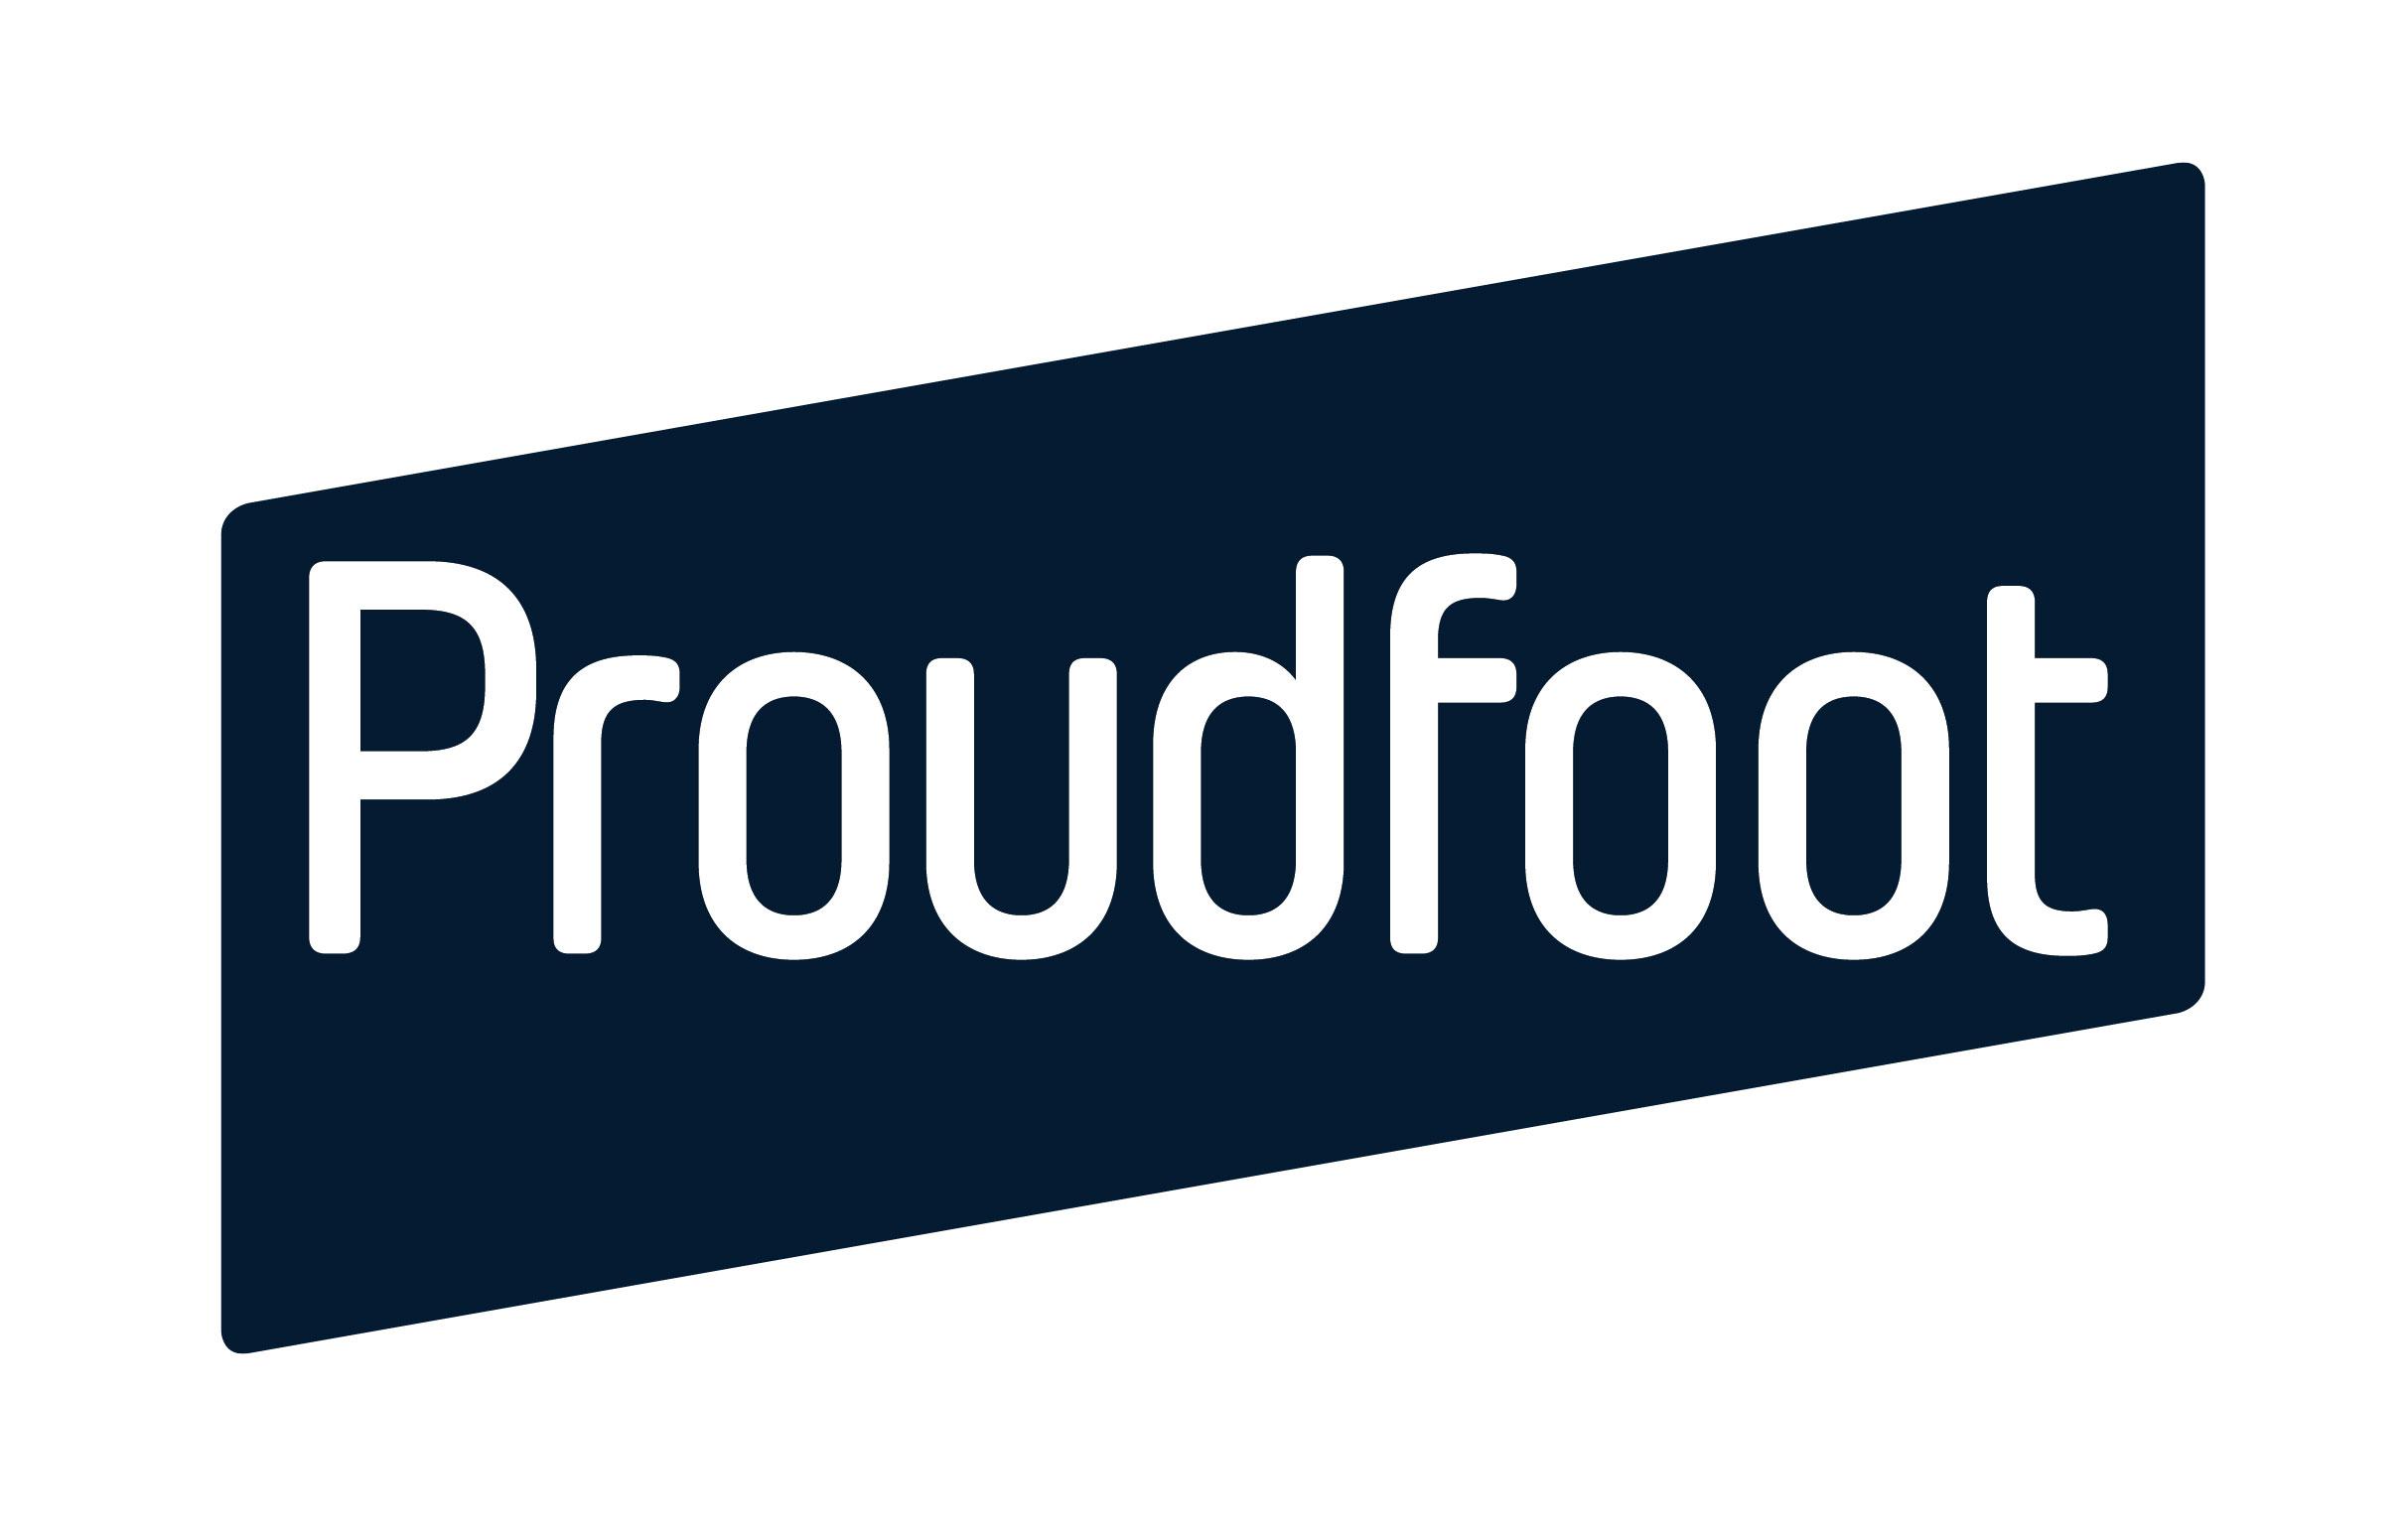 Proudfoot logo blue